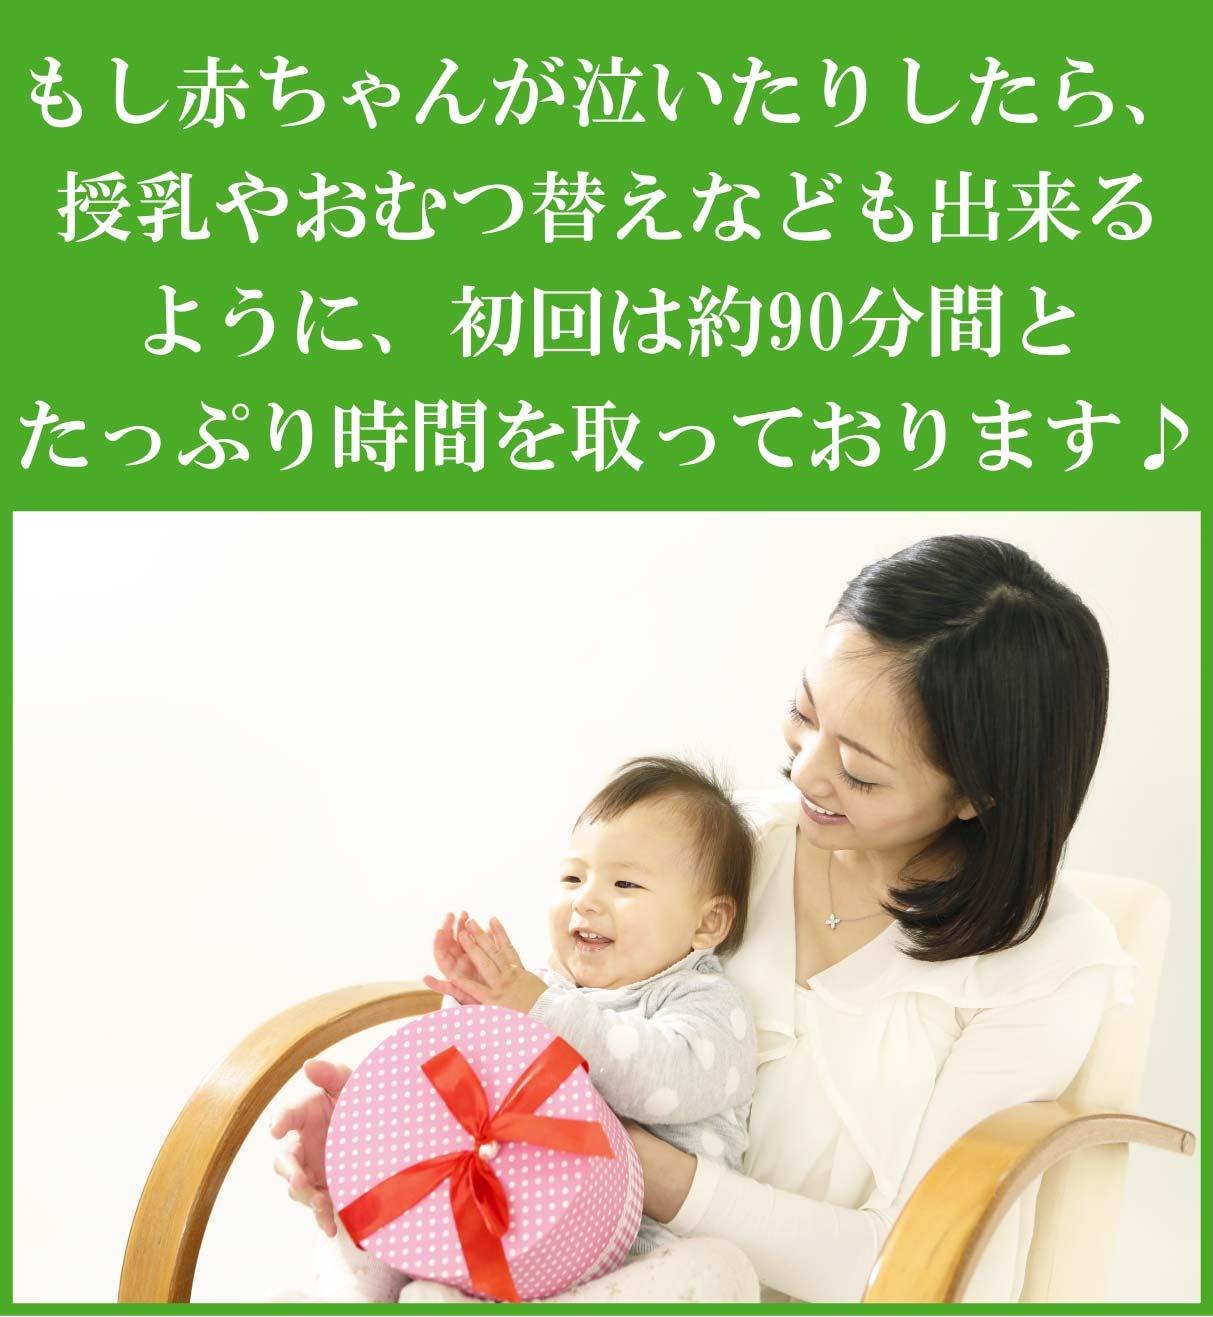 syokai-moshi-green.jpg